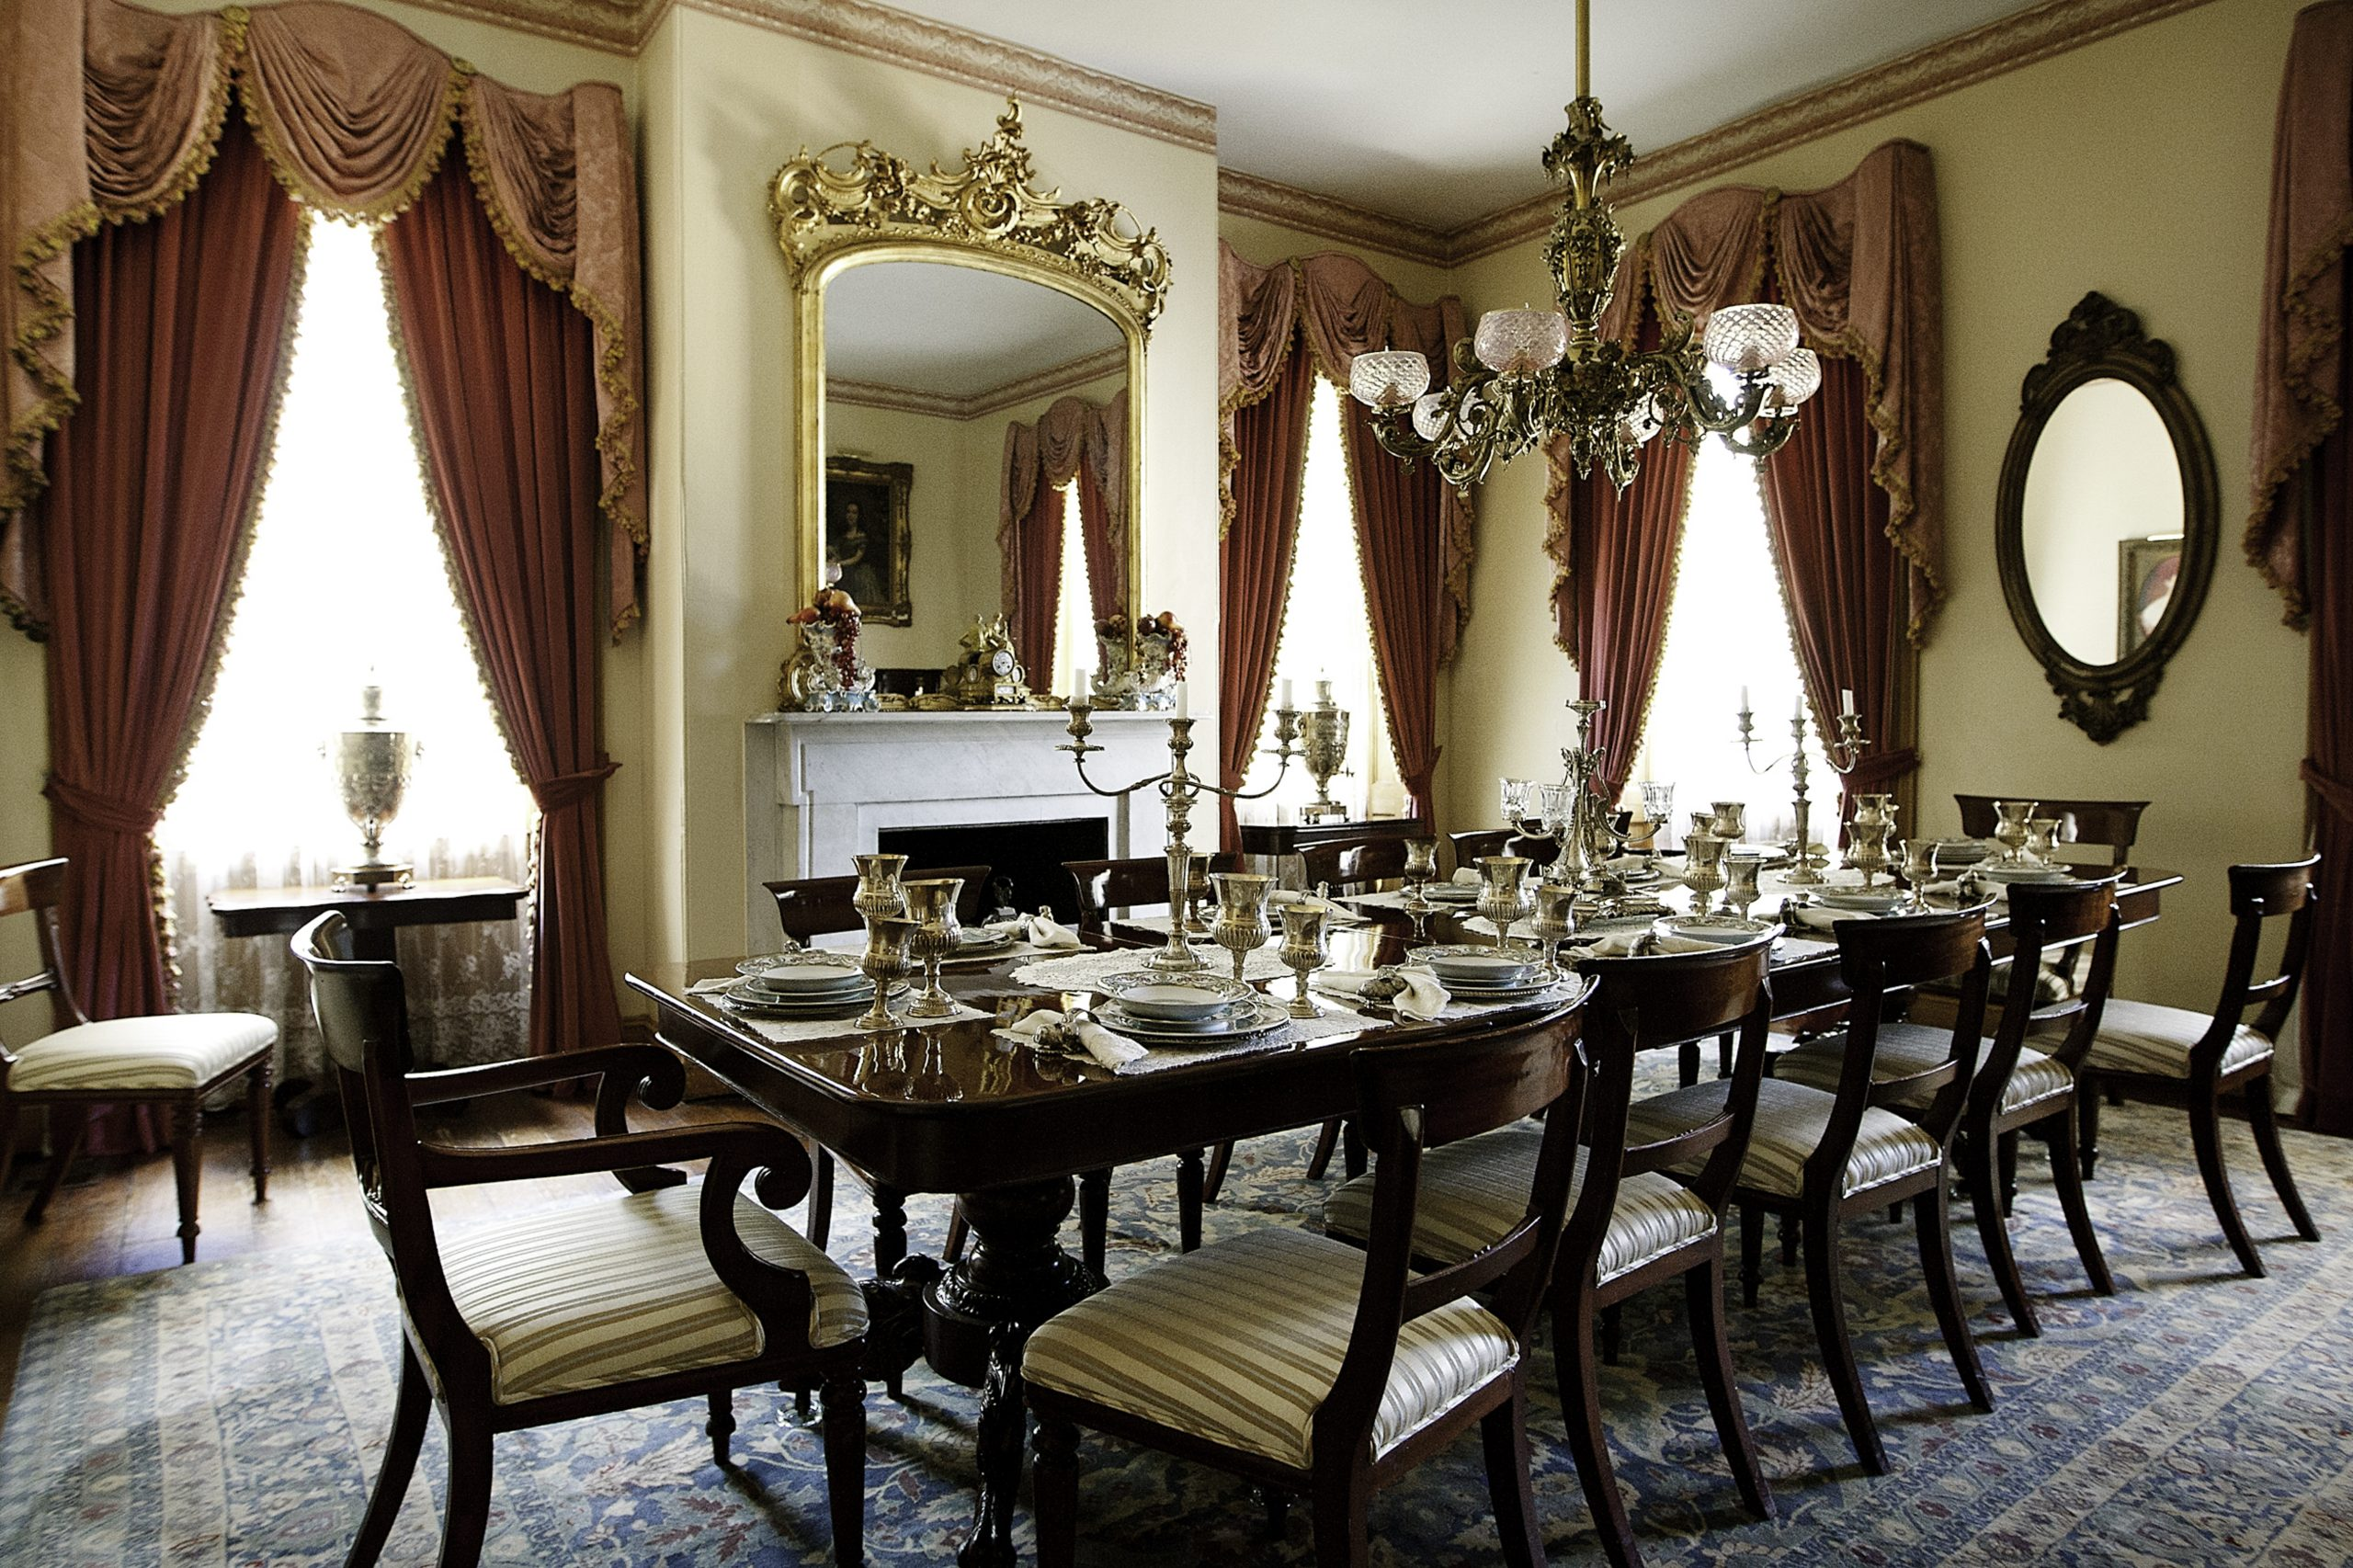 Monmouth-historic-inn-Dining-Room